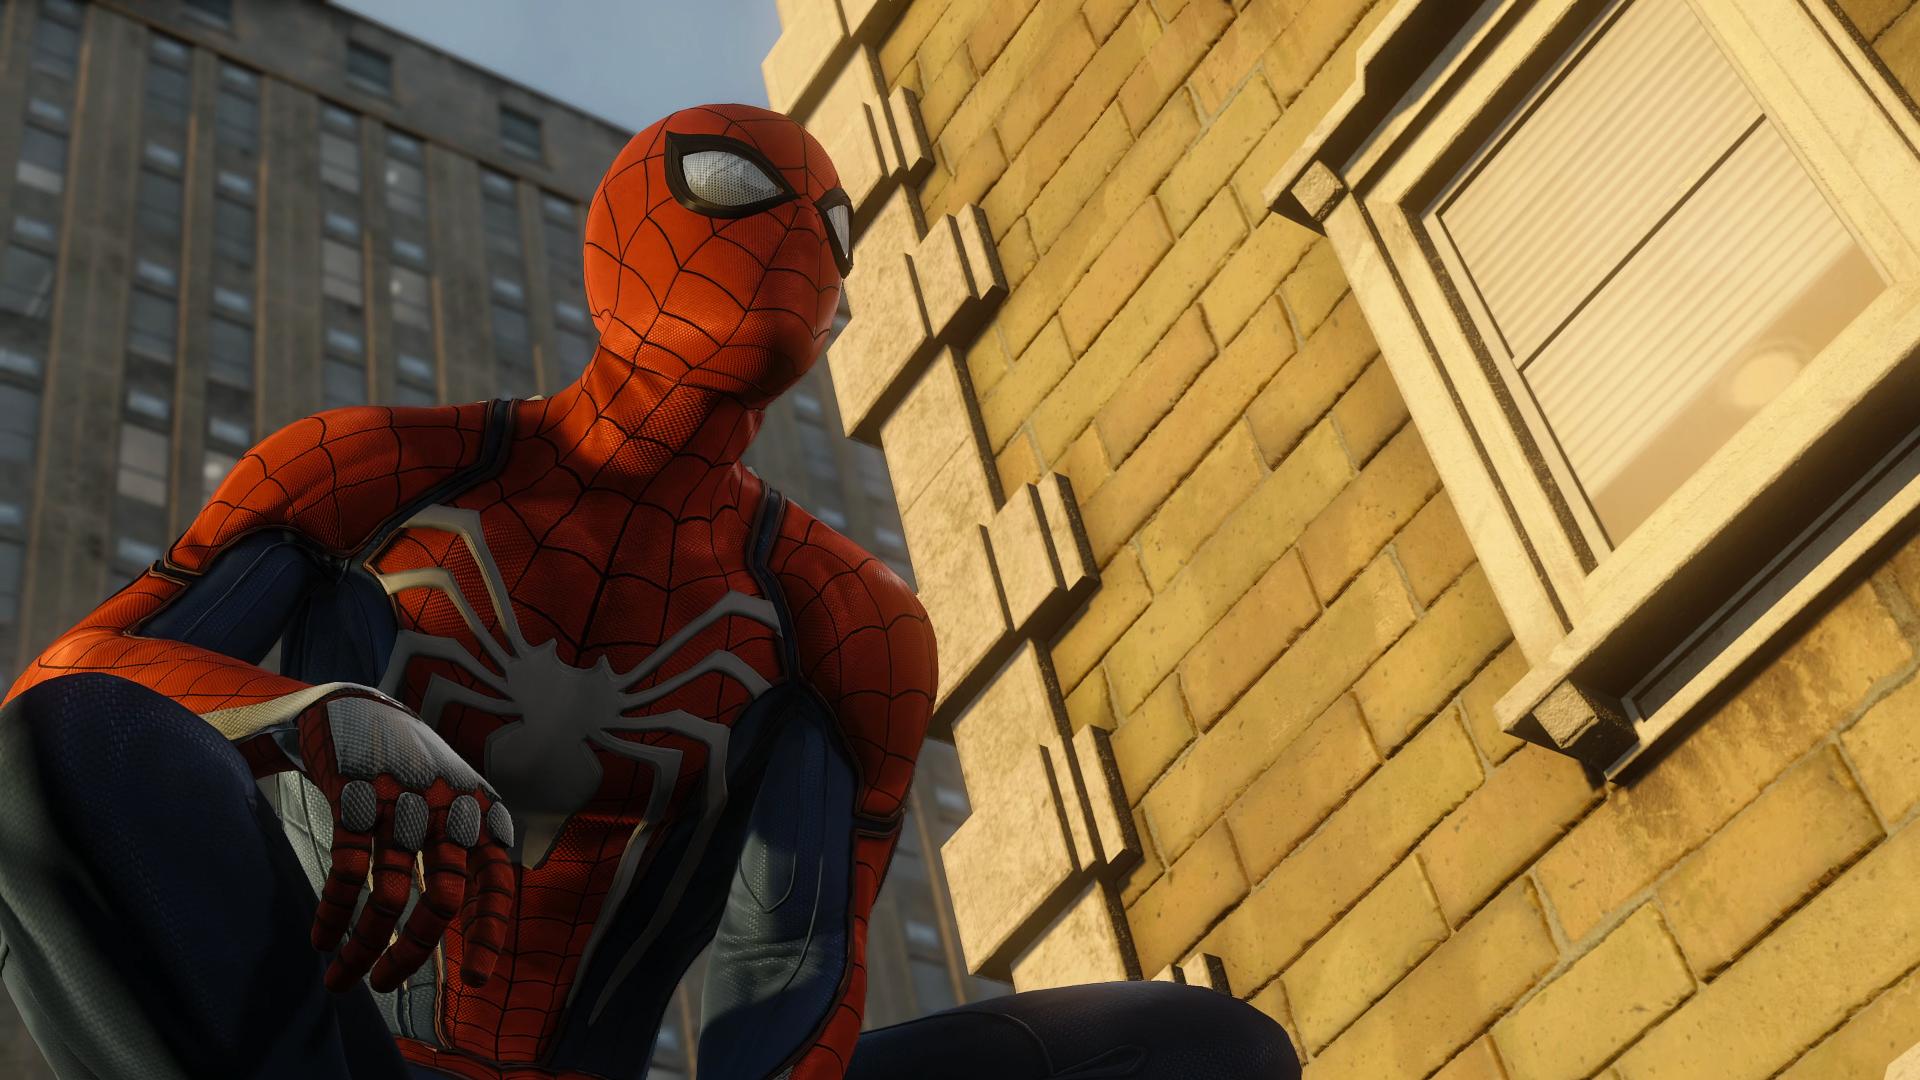 wallpaper : spider man, video games, superhero 1920x1080 - efqih23